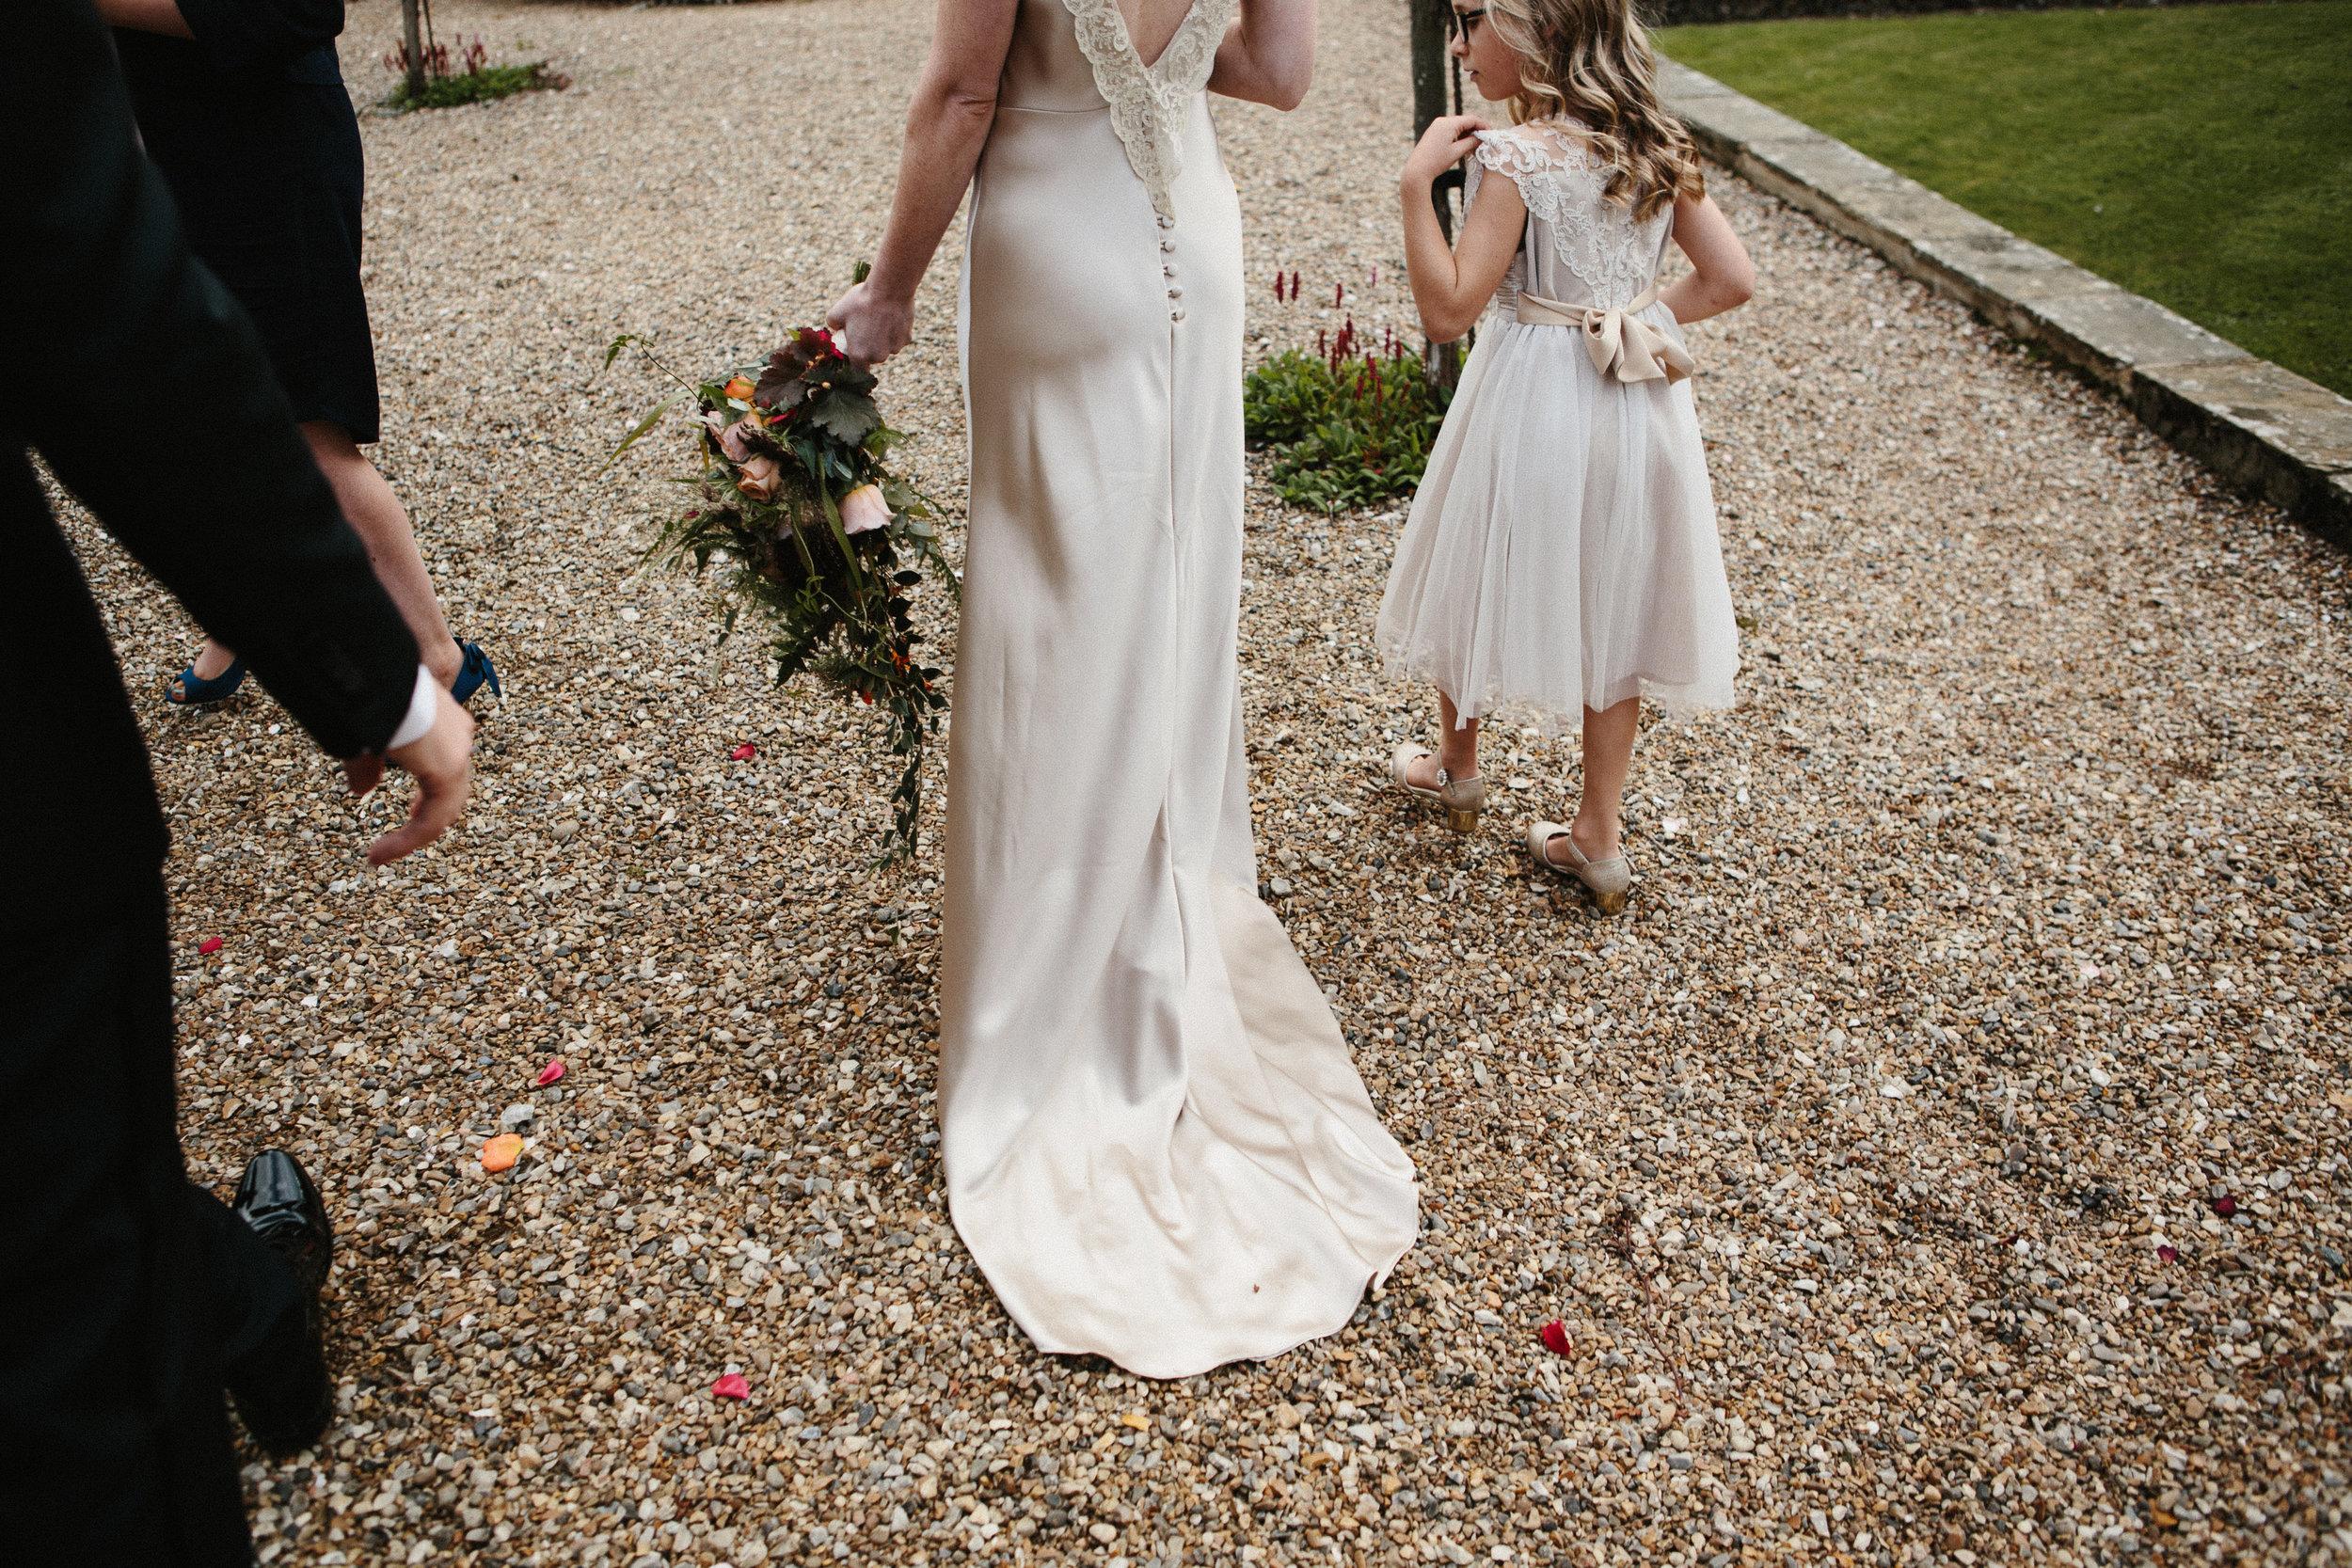 Kate-Beaumont-Sheffield-Honeysuckle-bias-cut-wedding-dress-oyster-Rosie18.jpg